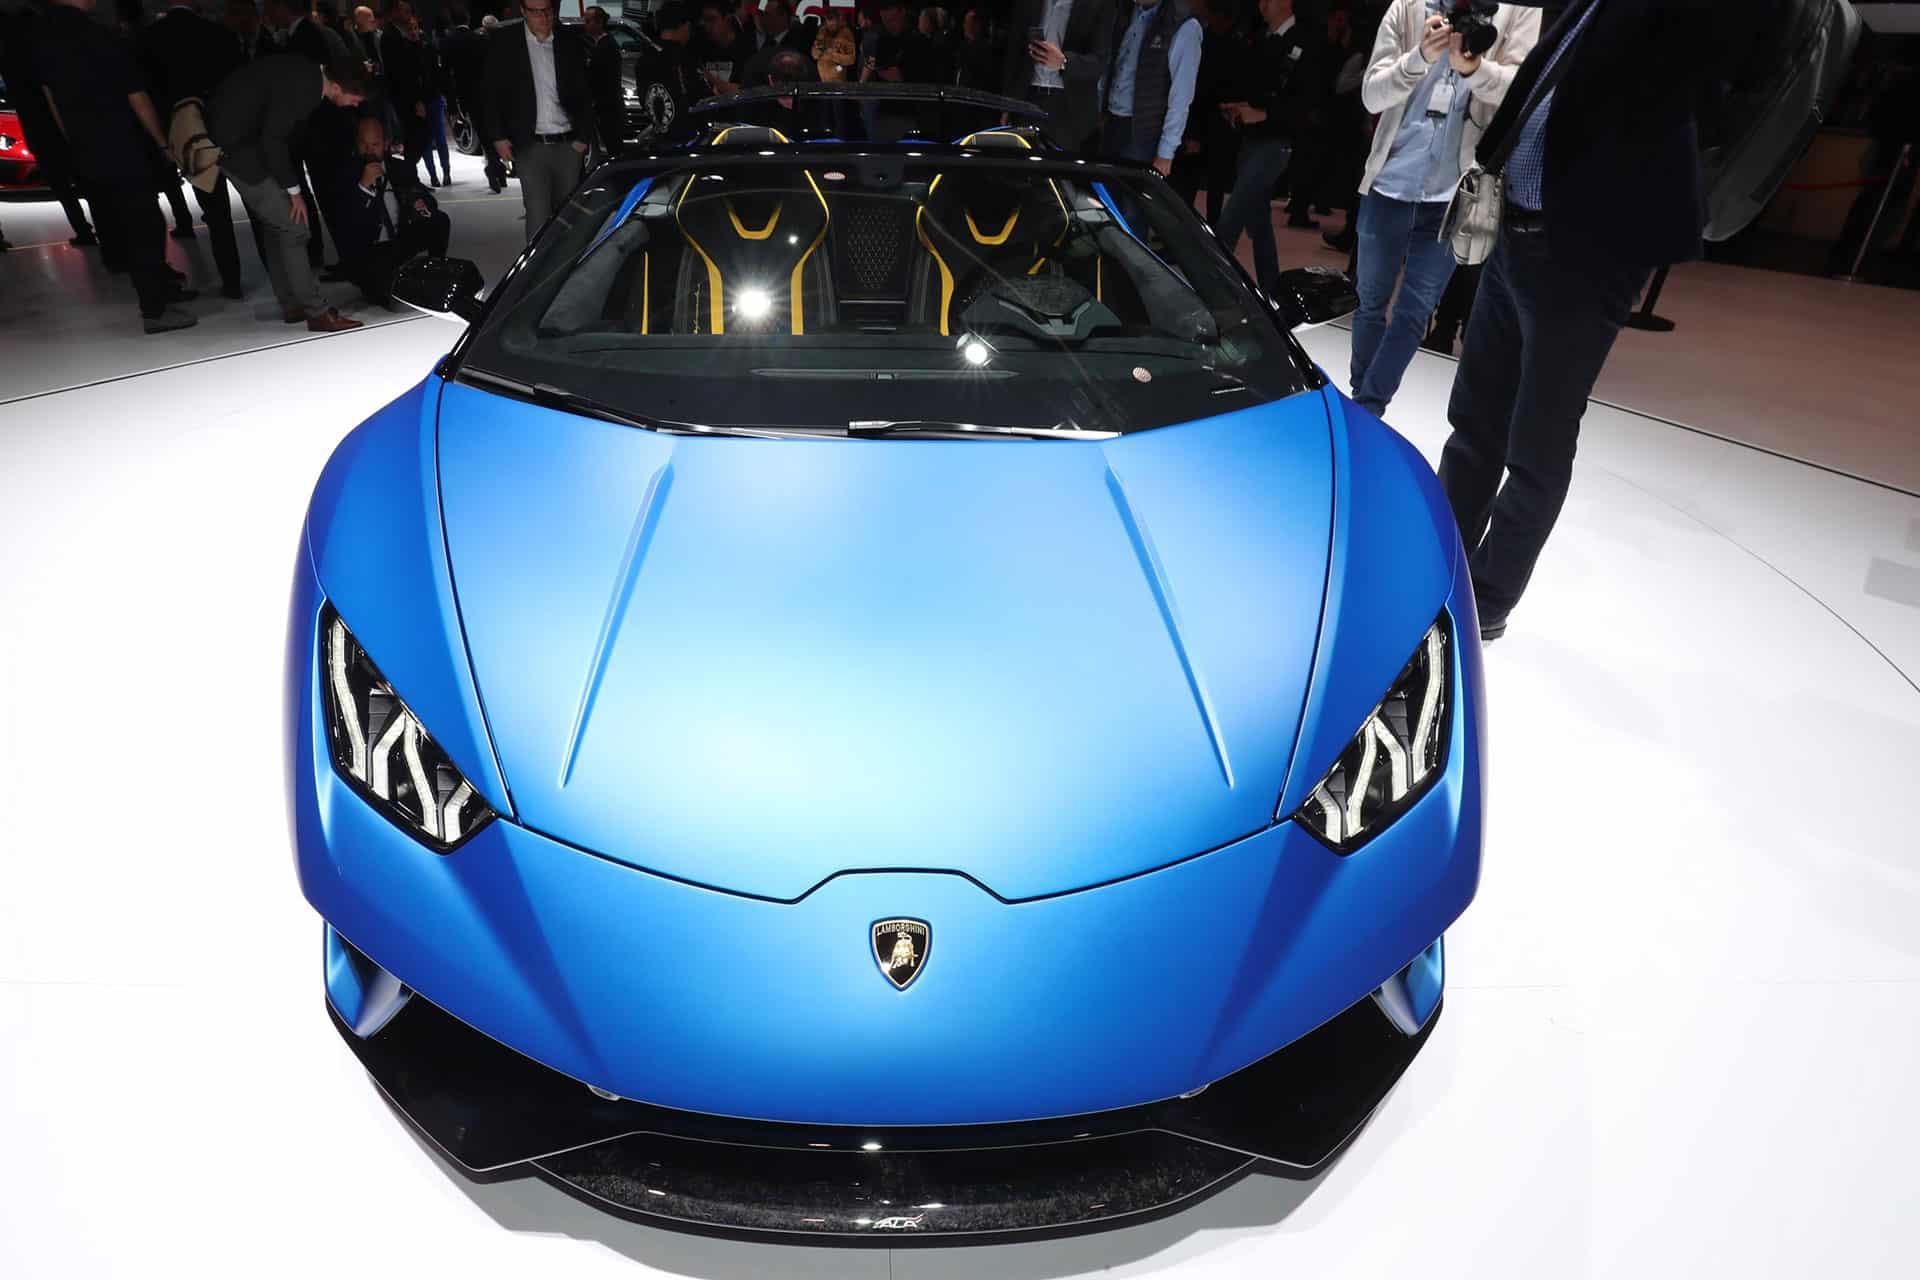 Lamborghini Huracan Performante Spyder The Car Expert Geneva